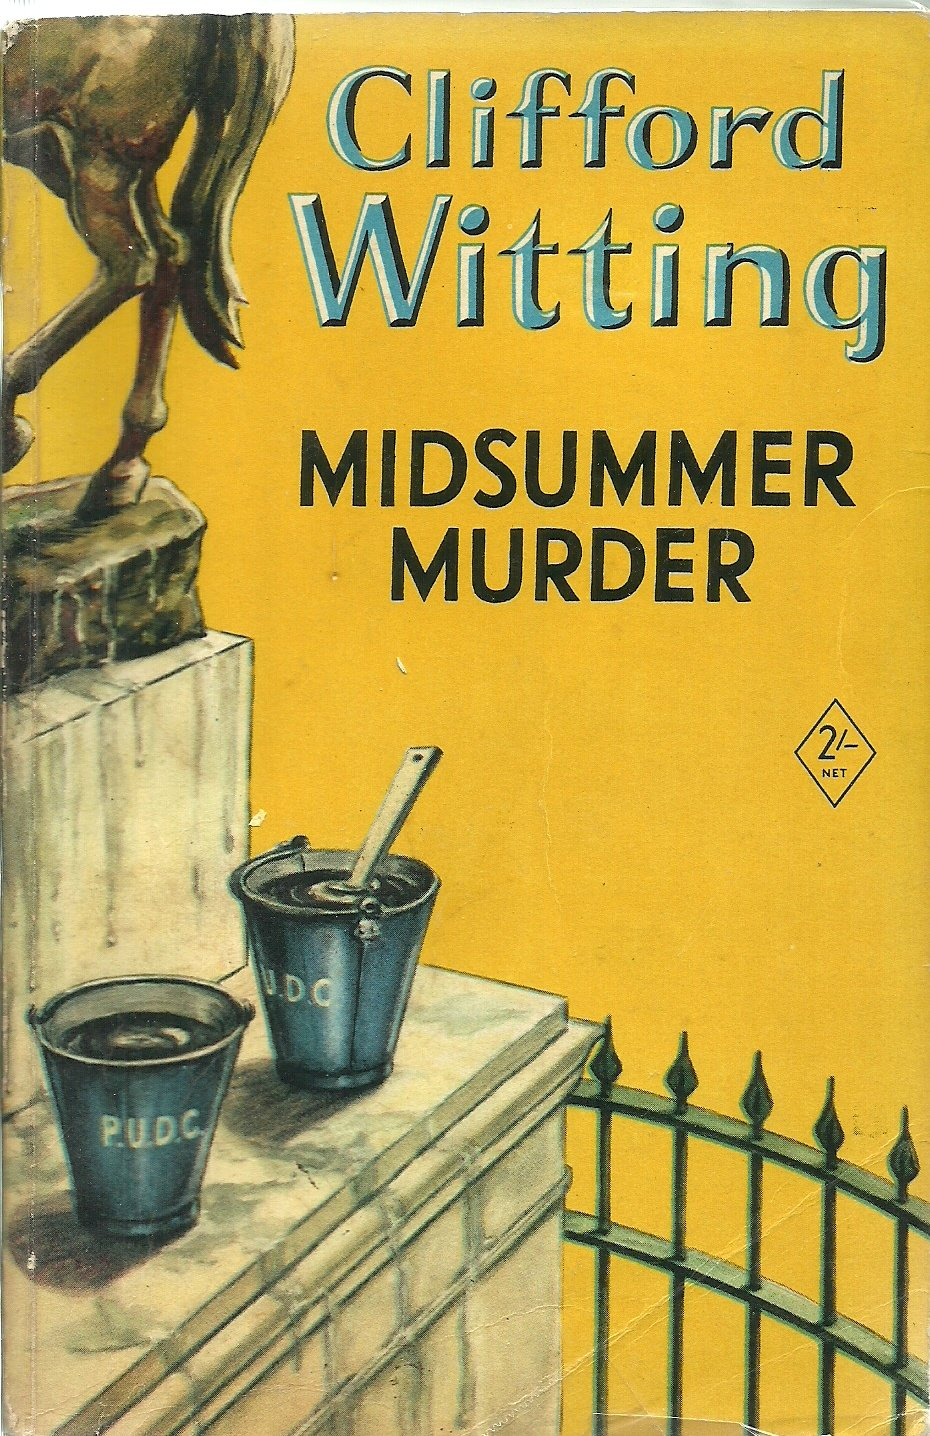 Image result for clifford witting midsummer murder